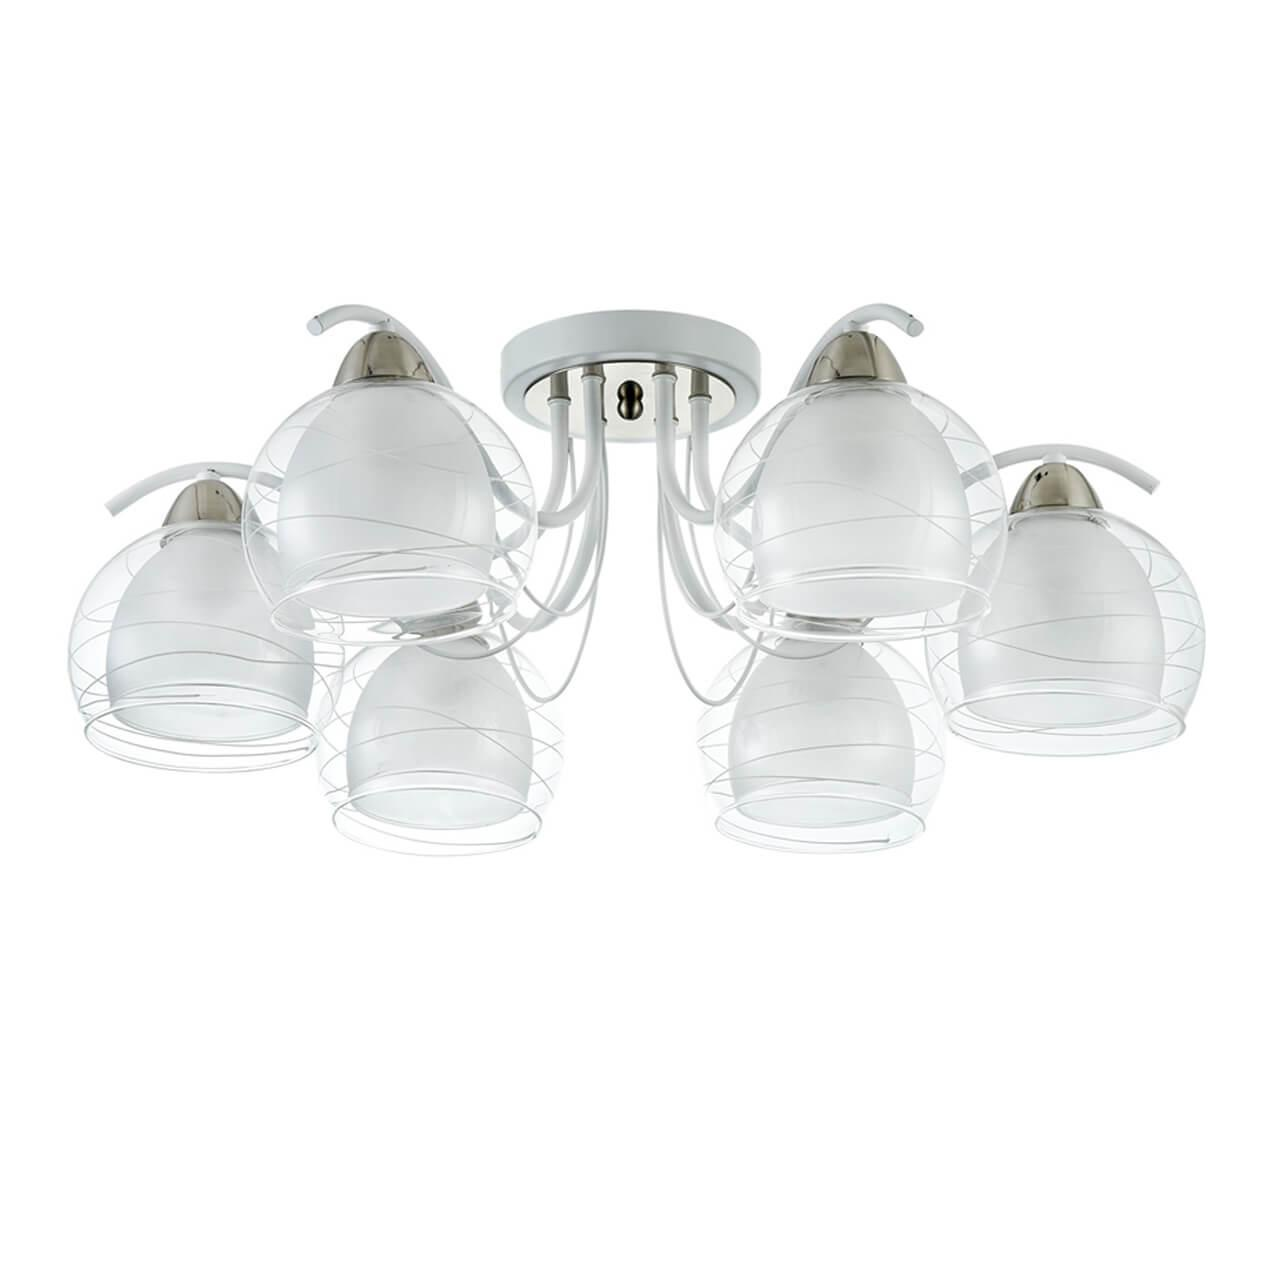 Потолочный светильник Freya FR5052-CL-06-W, E27, 60 Вт люстра freya freya fr5052 cl 03 w